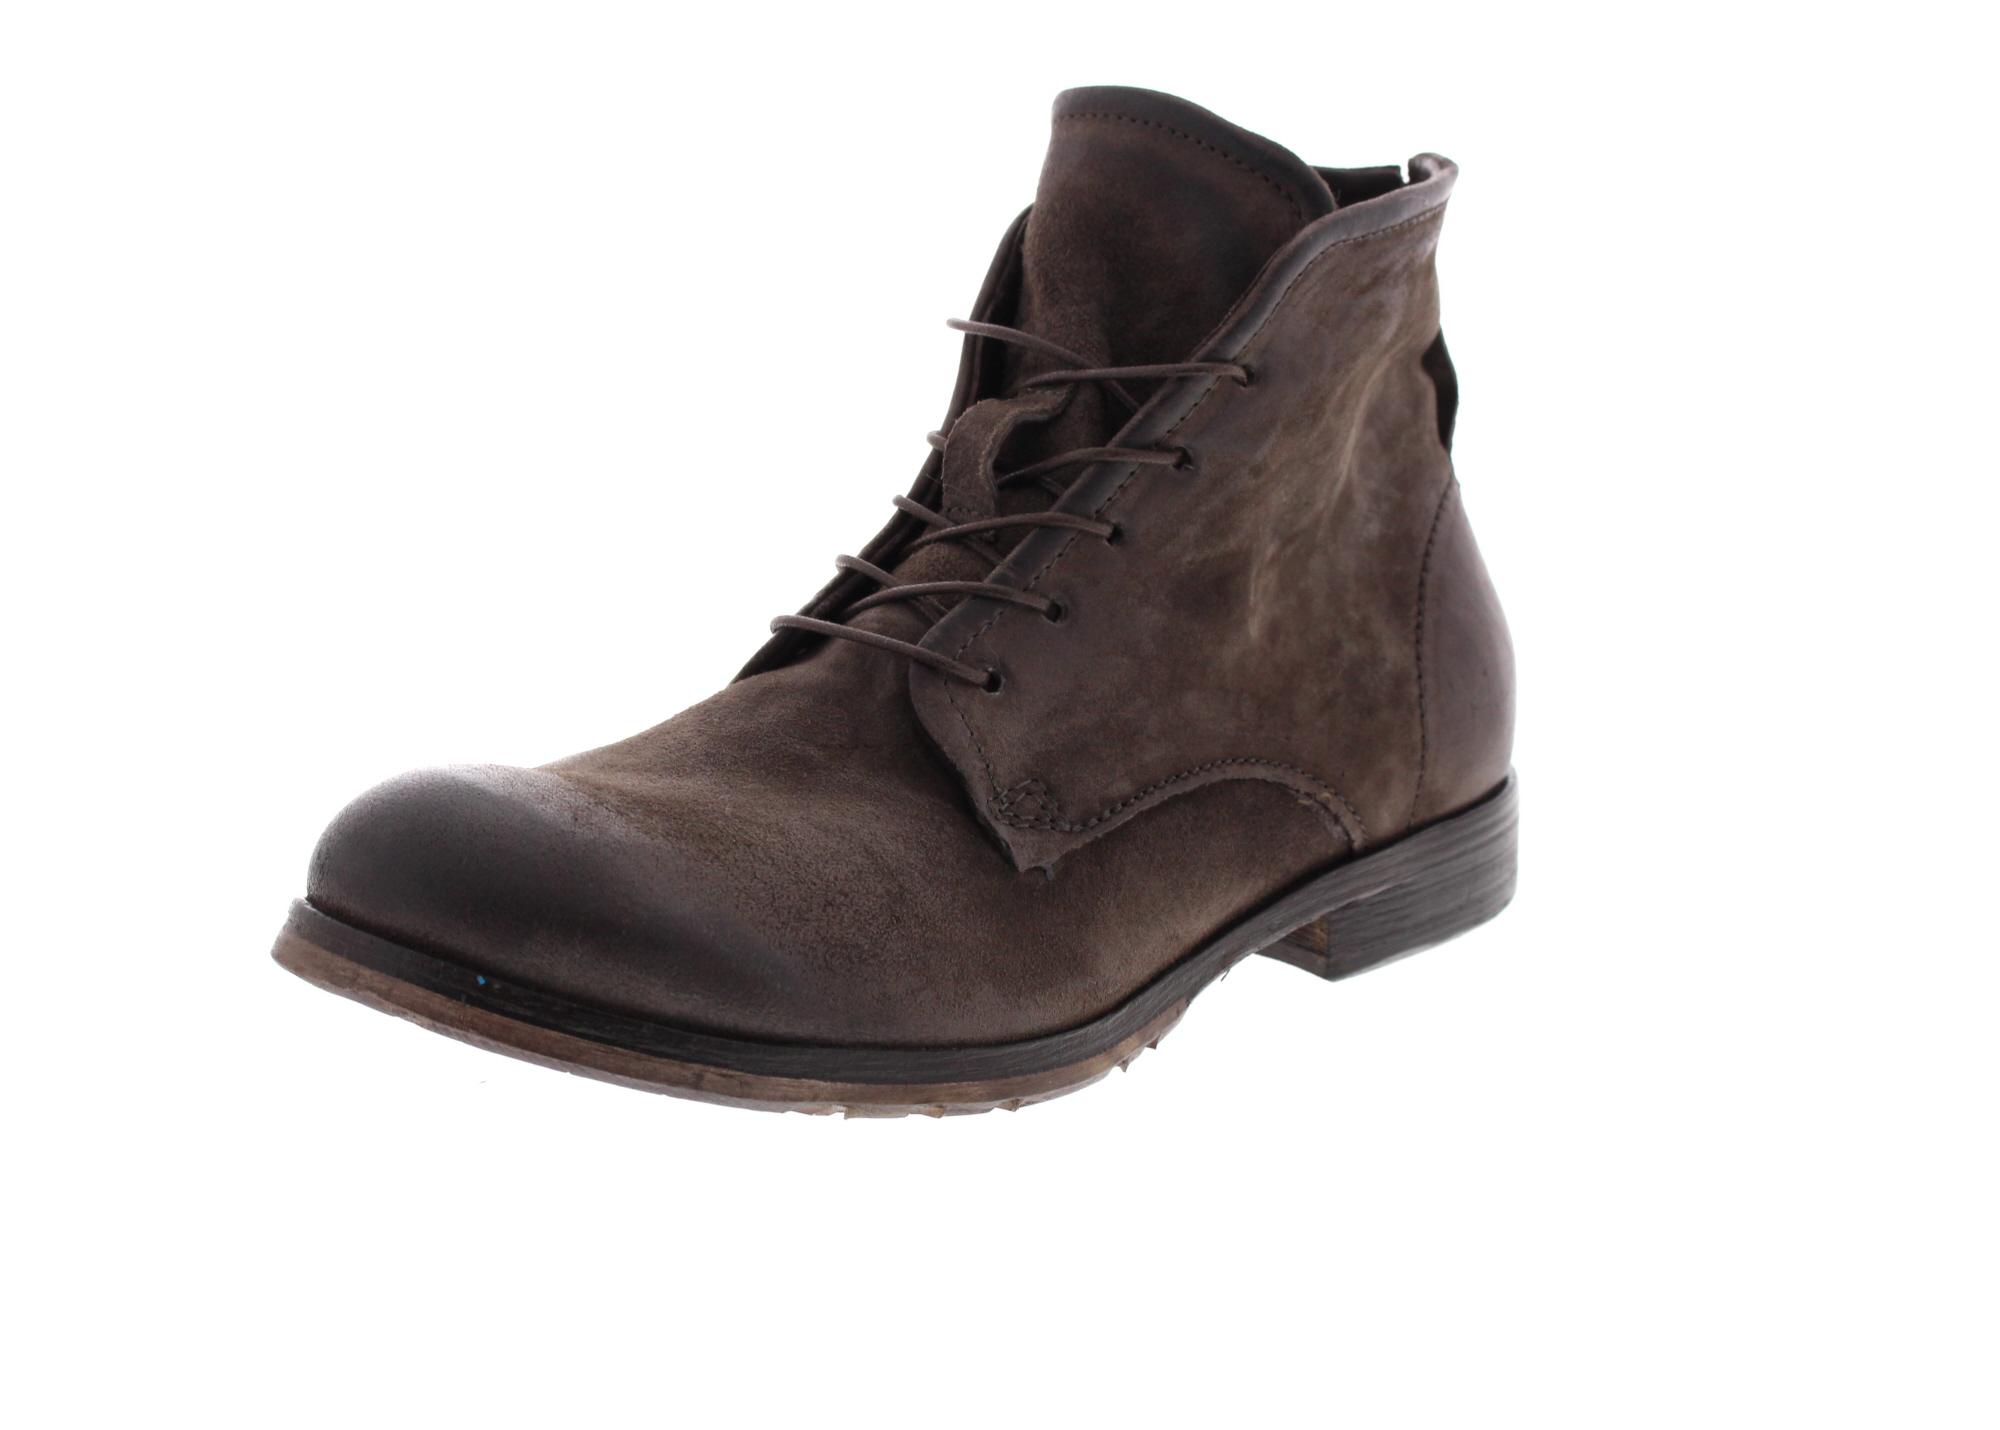 A.S.98 Herrenschuhe - Boots CLASH 401201-1103 - smoke0-6700